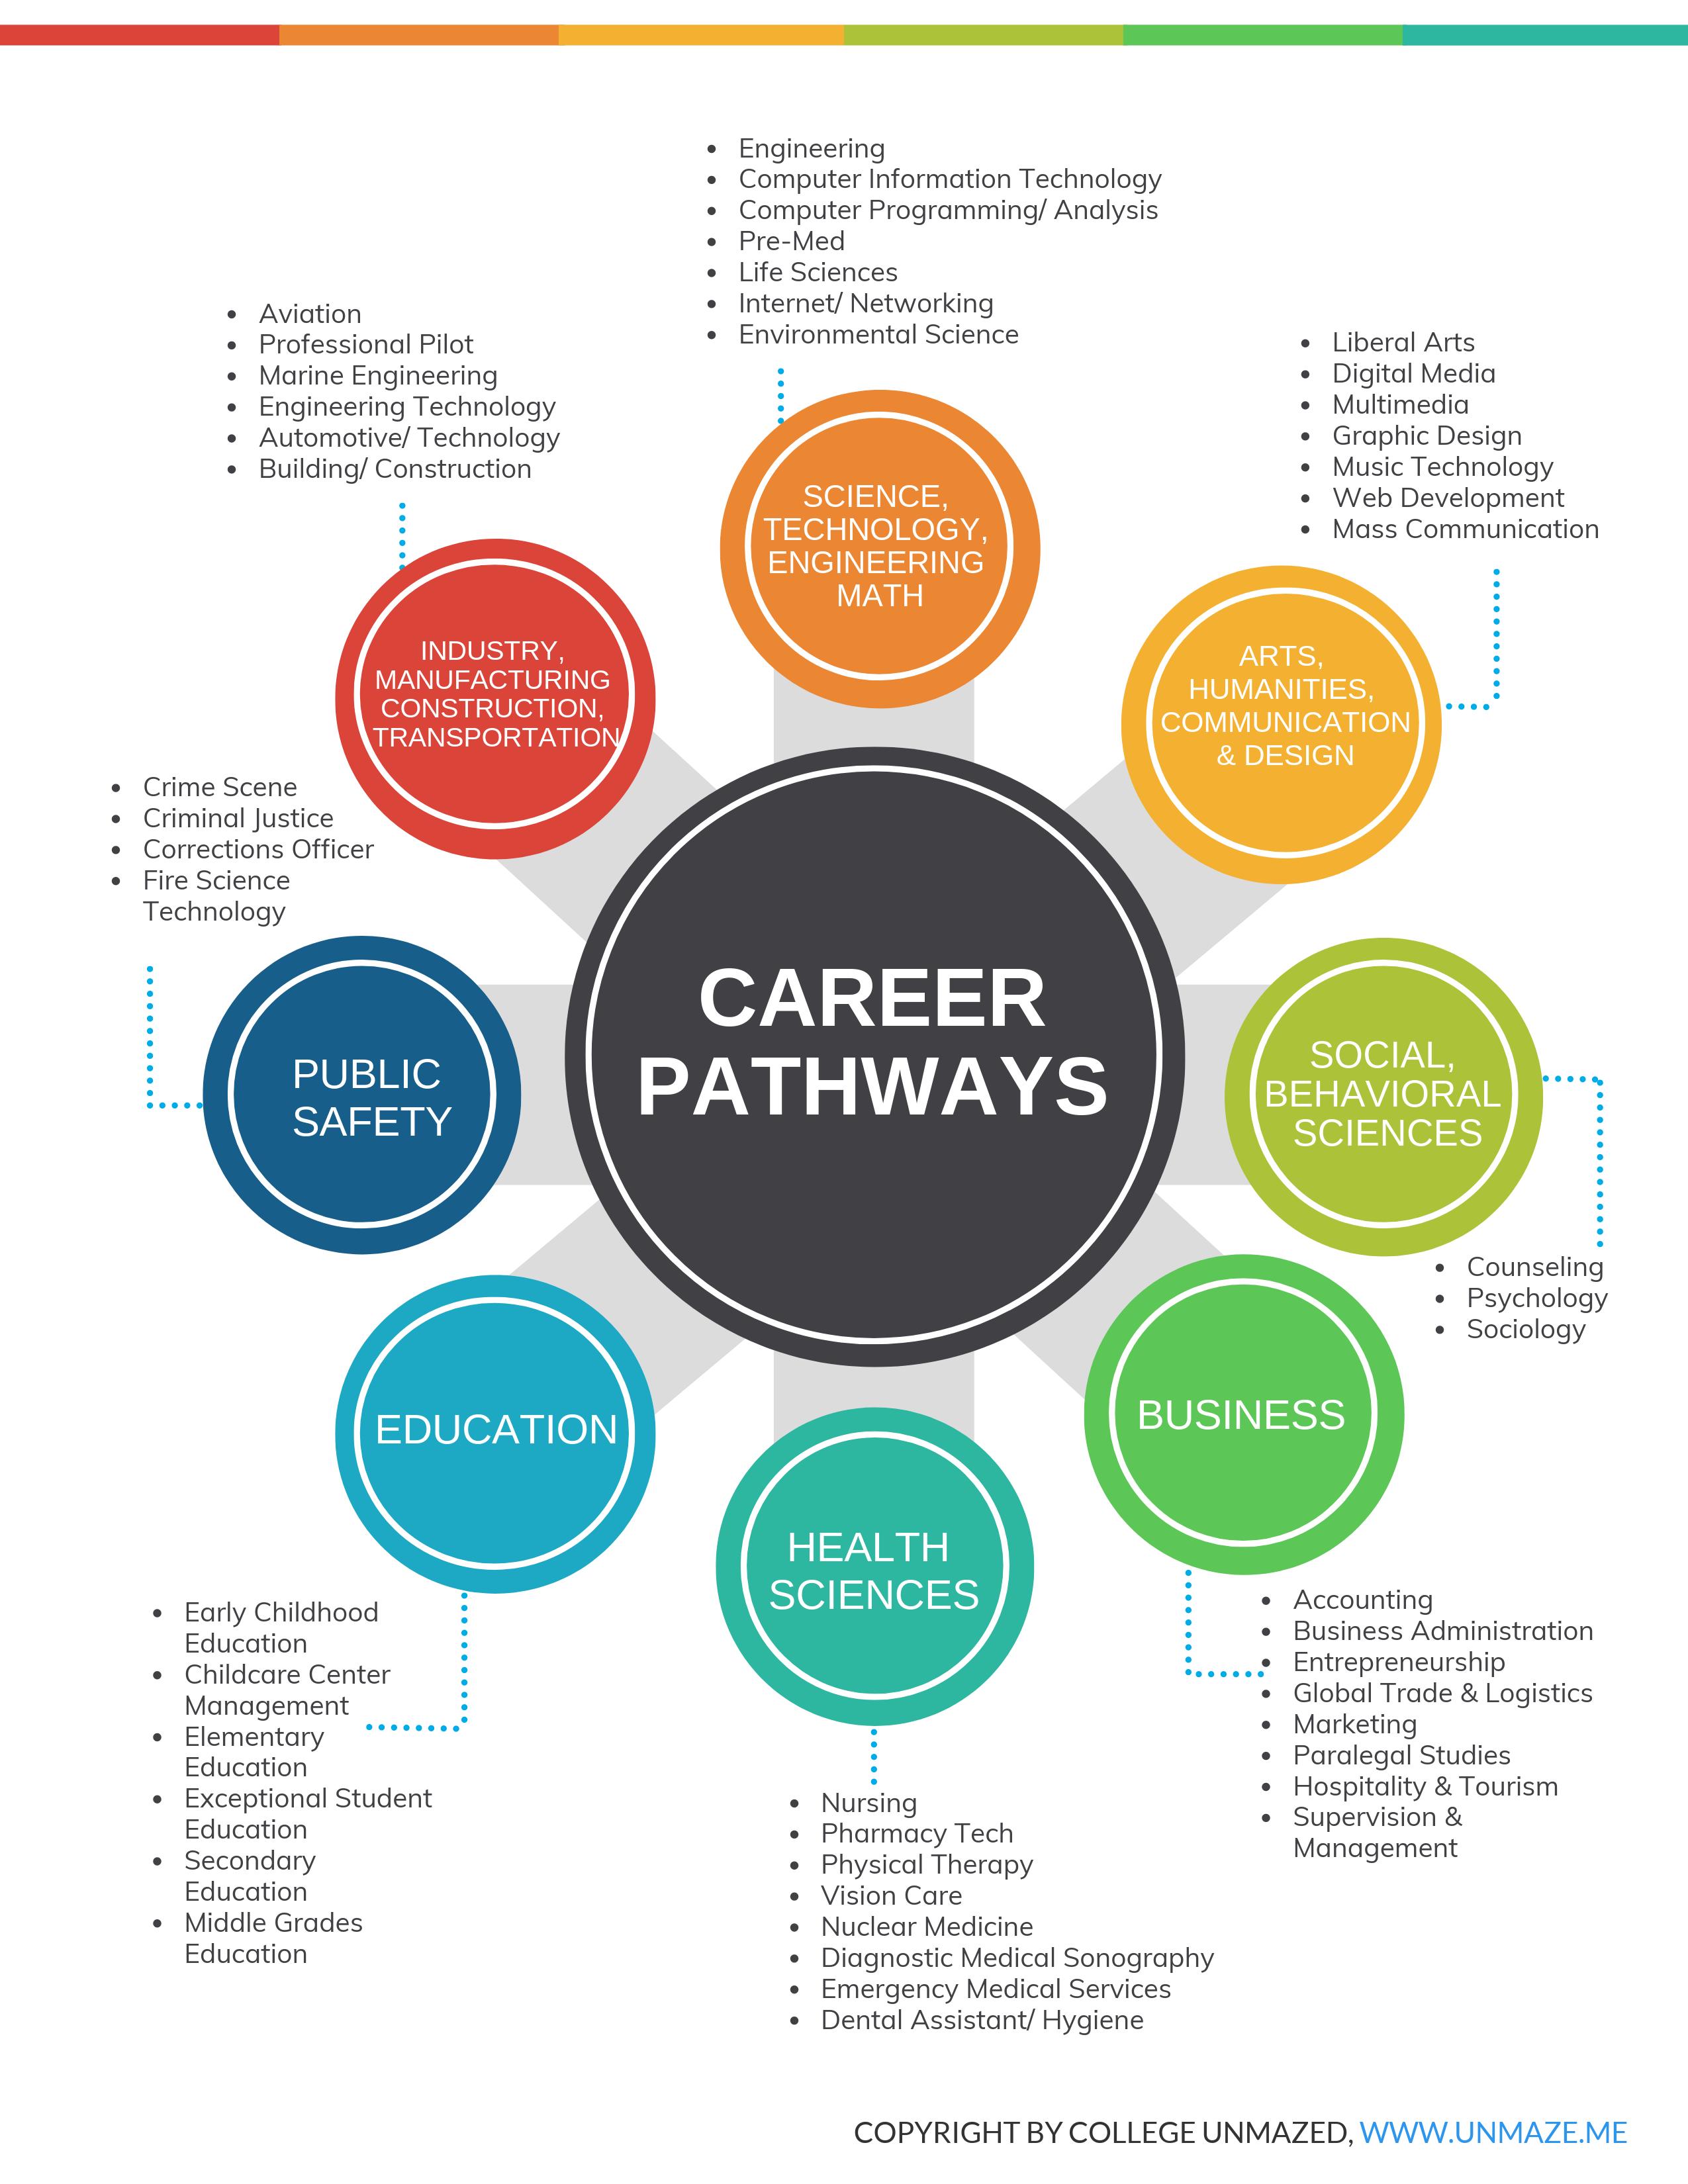 Career Pathways Infographic Amanda Sterk